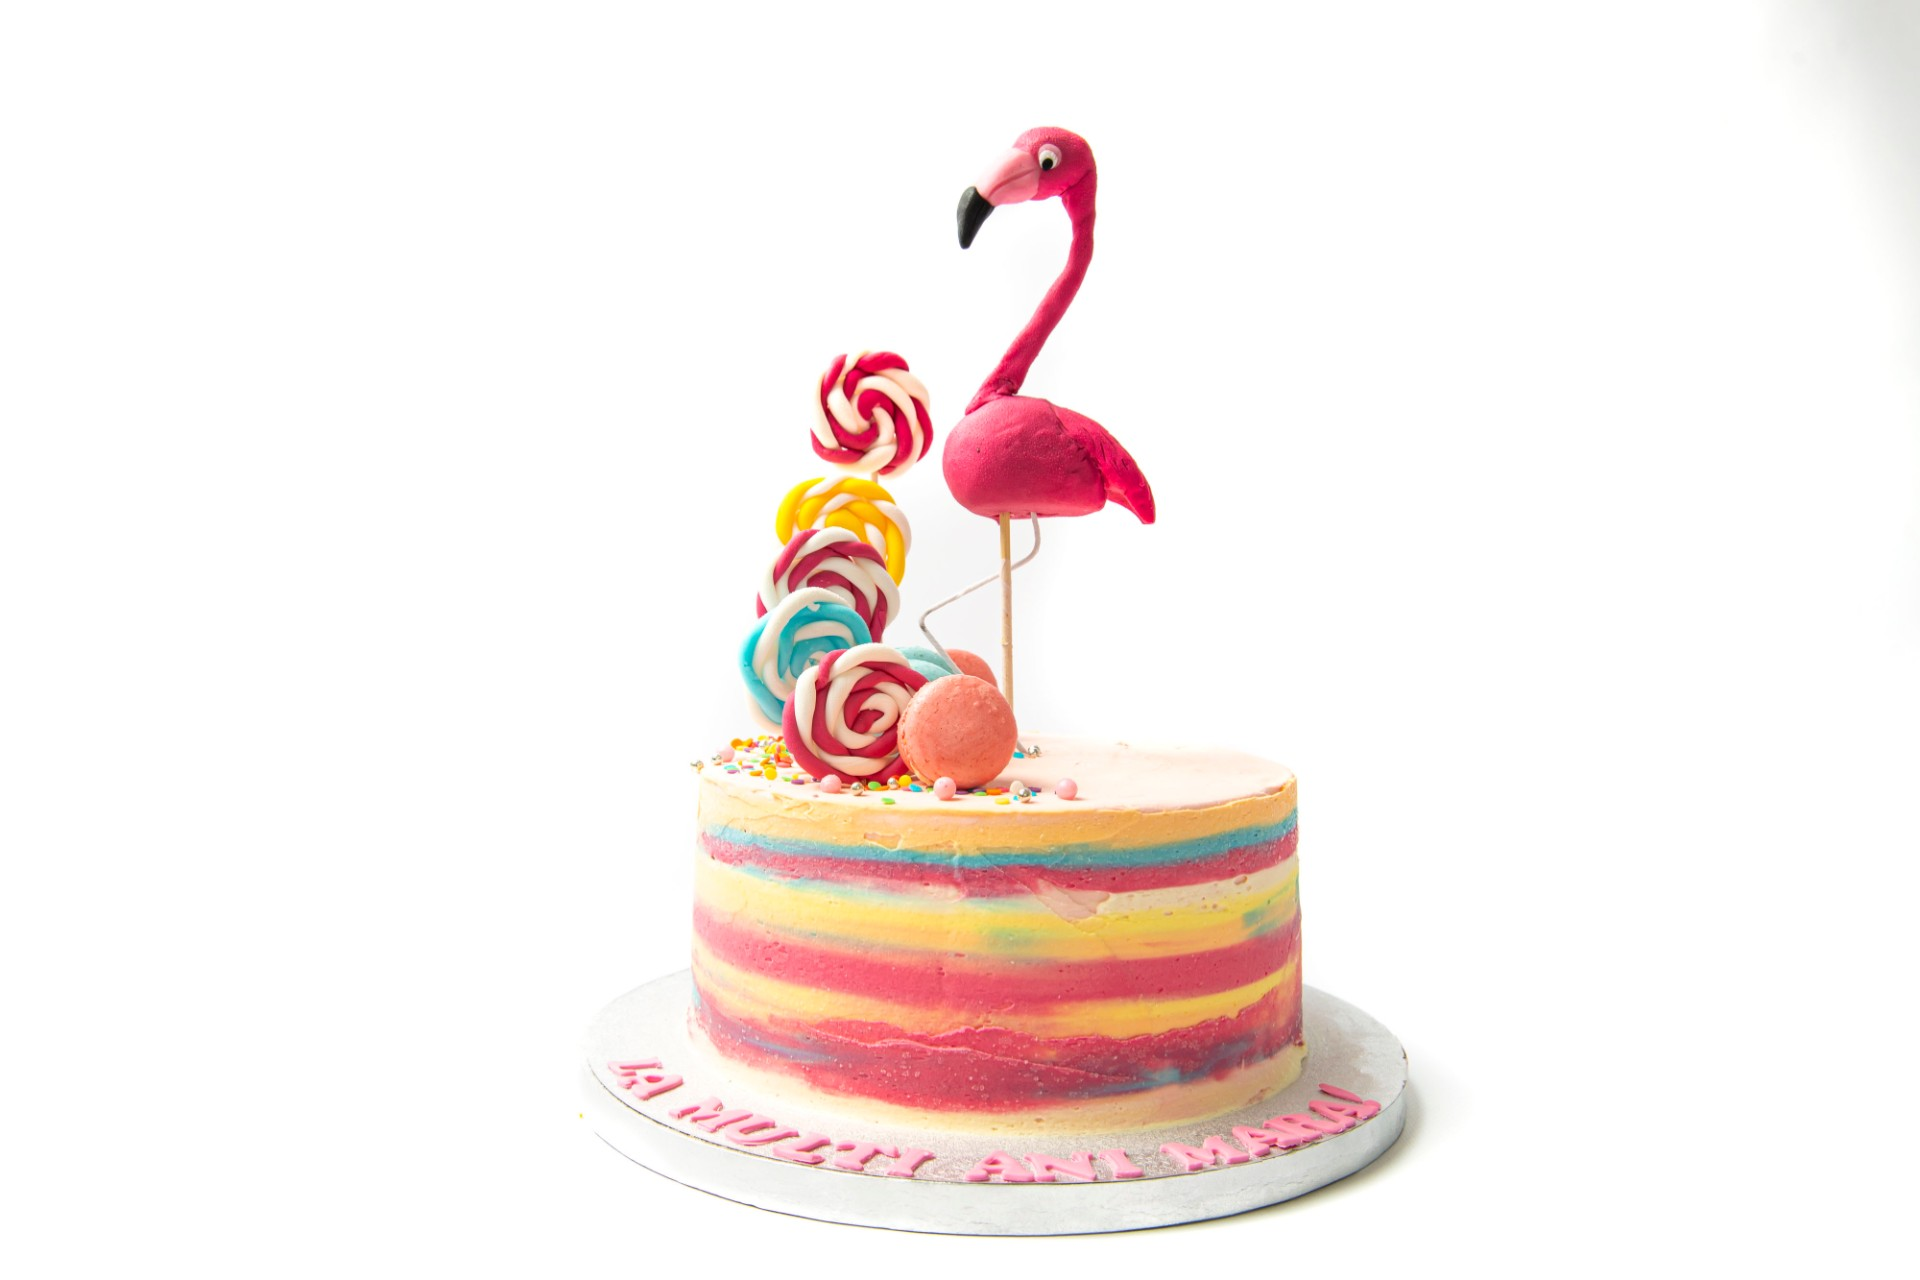 Tort Aniversare - Tematica Flamingo